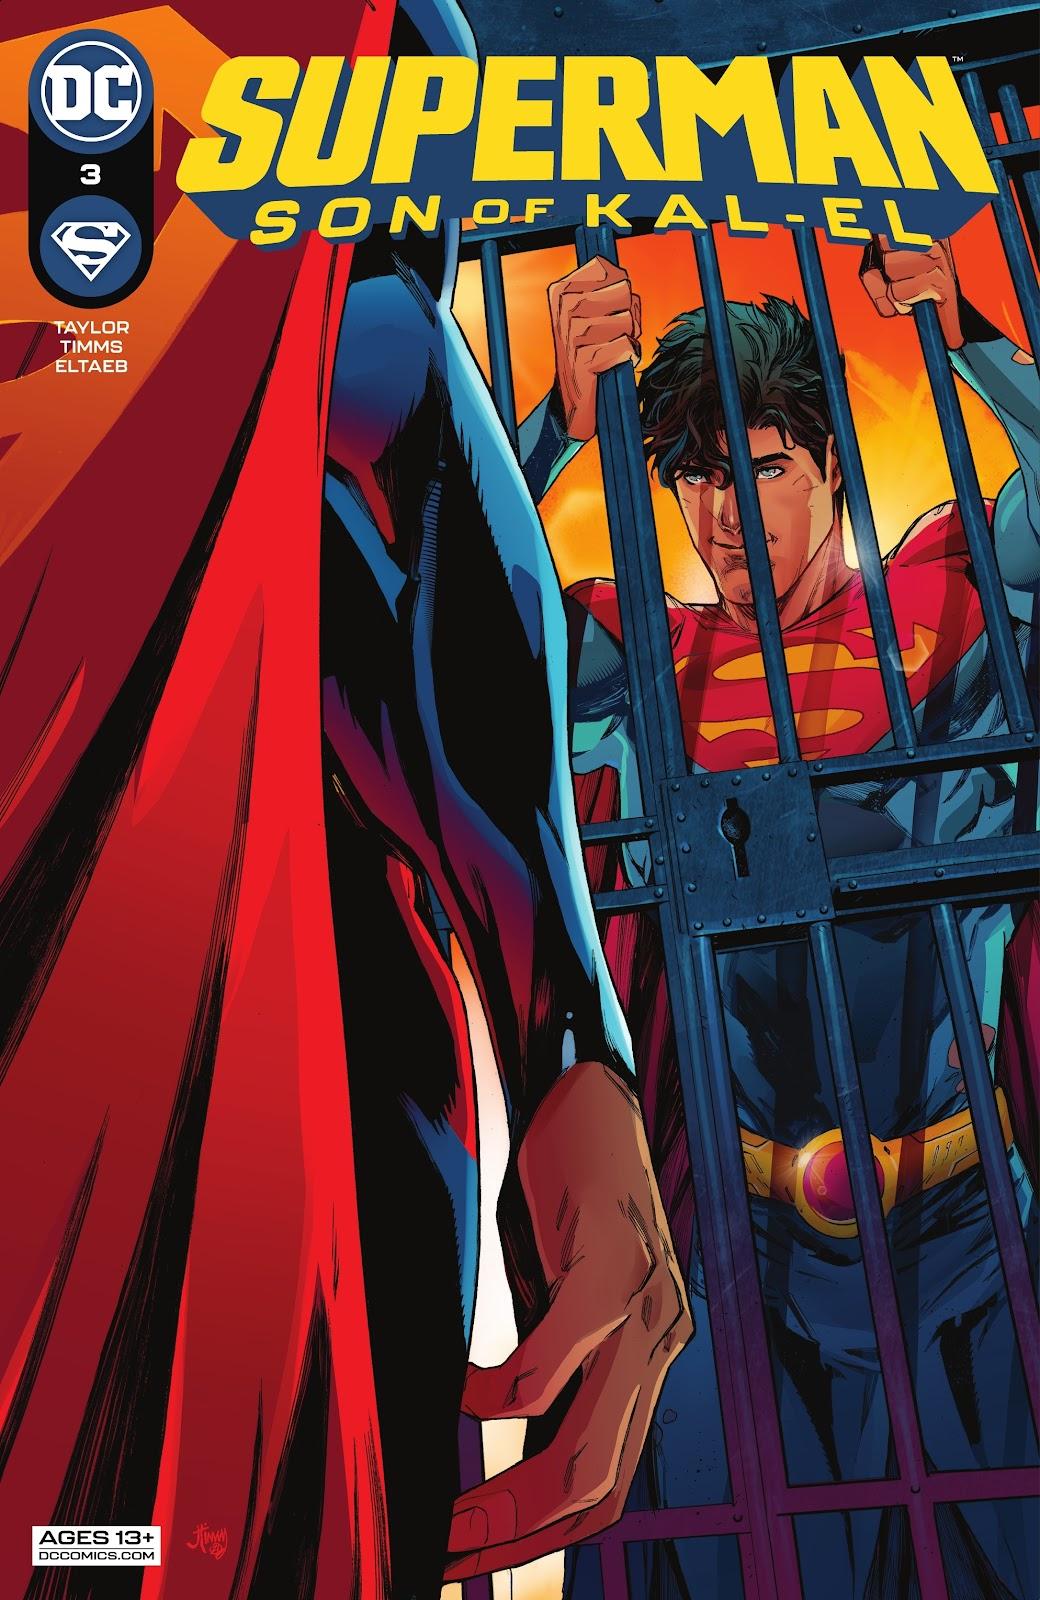 Superman Son of Kal-El 2, cover, 2021, John Timms